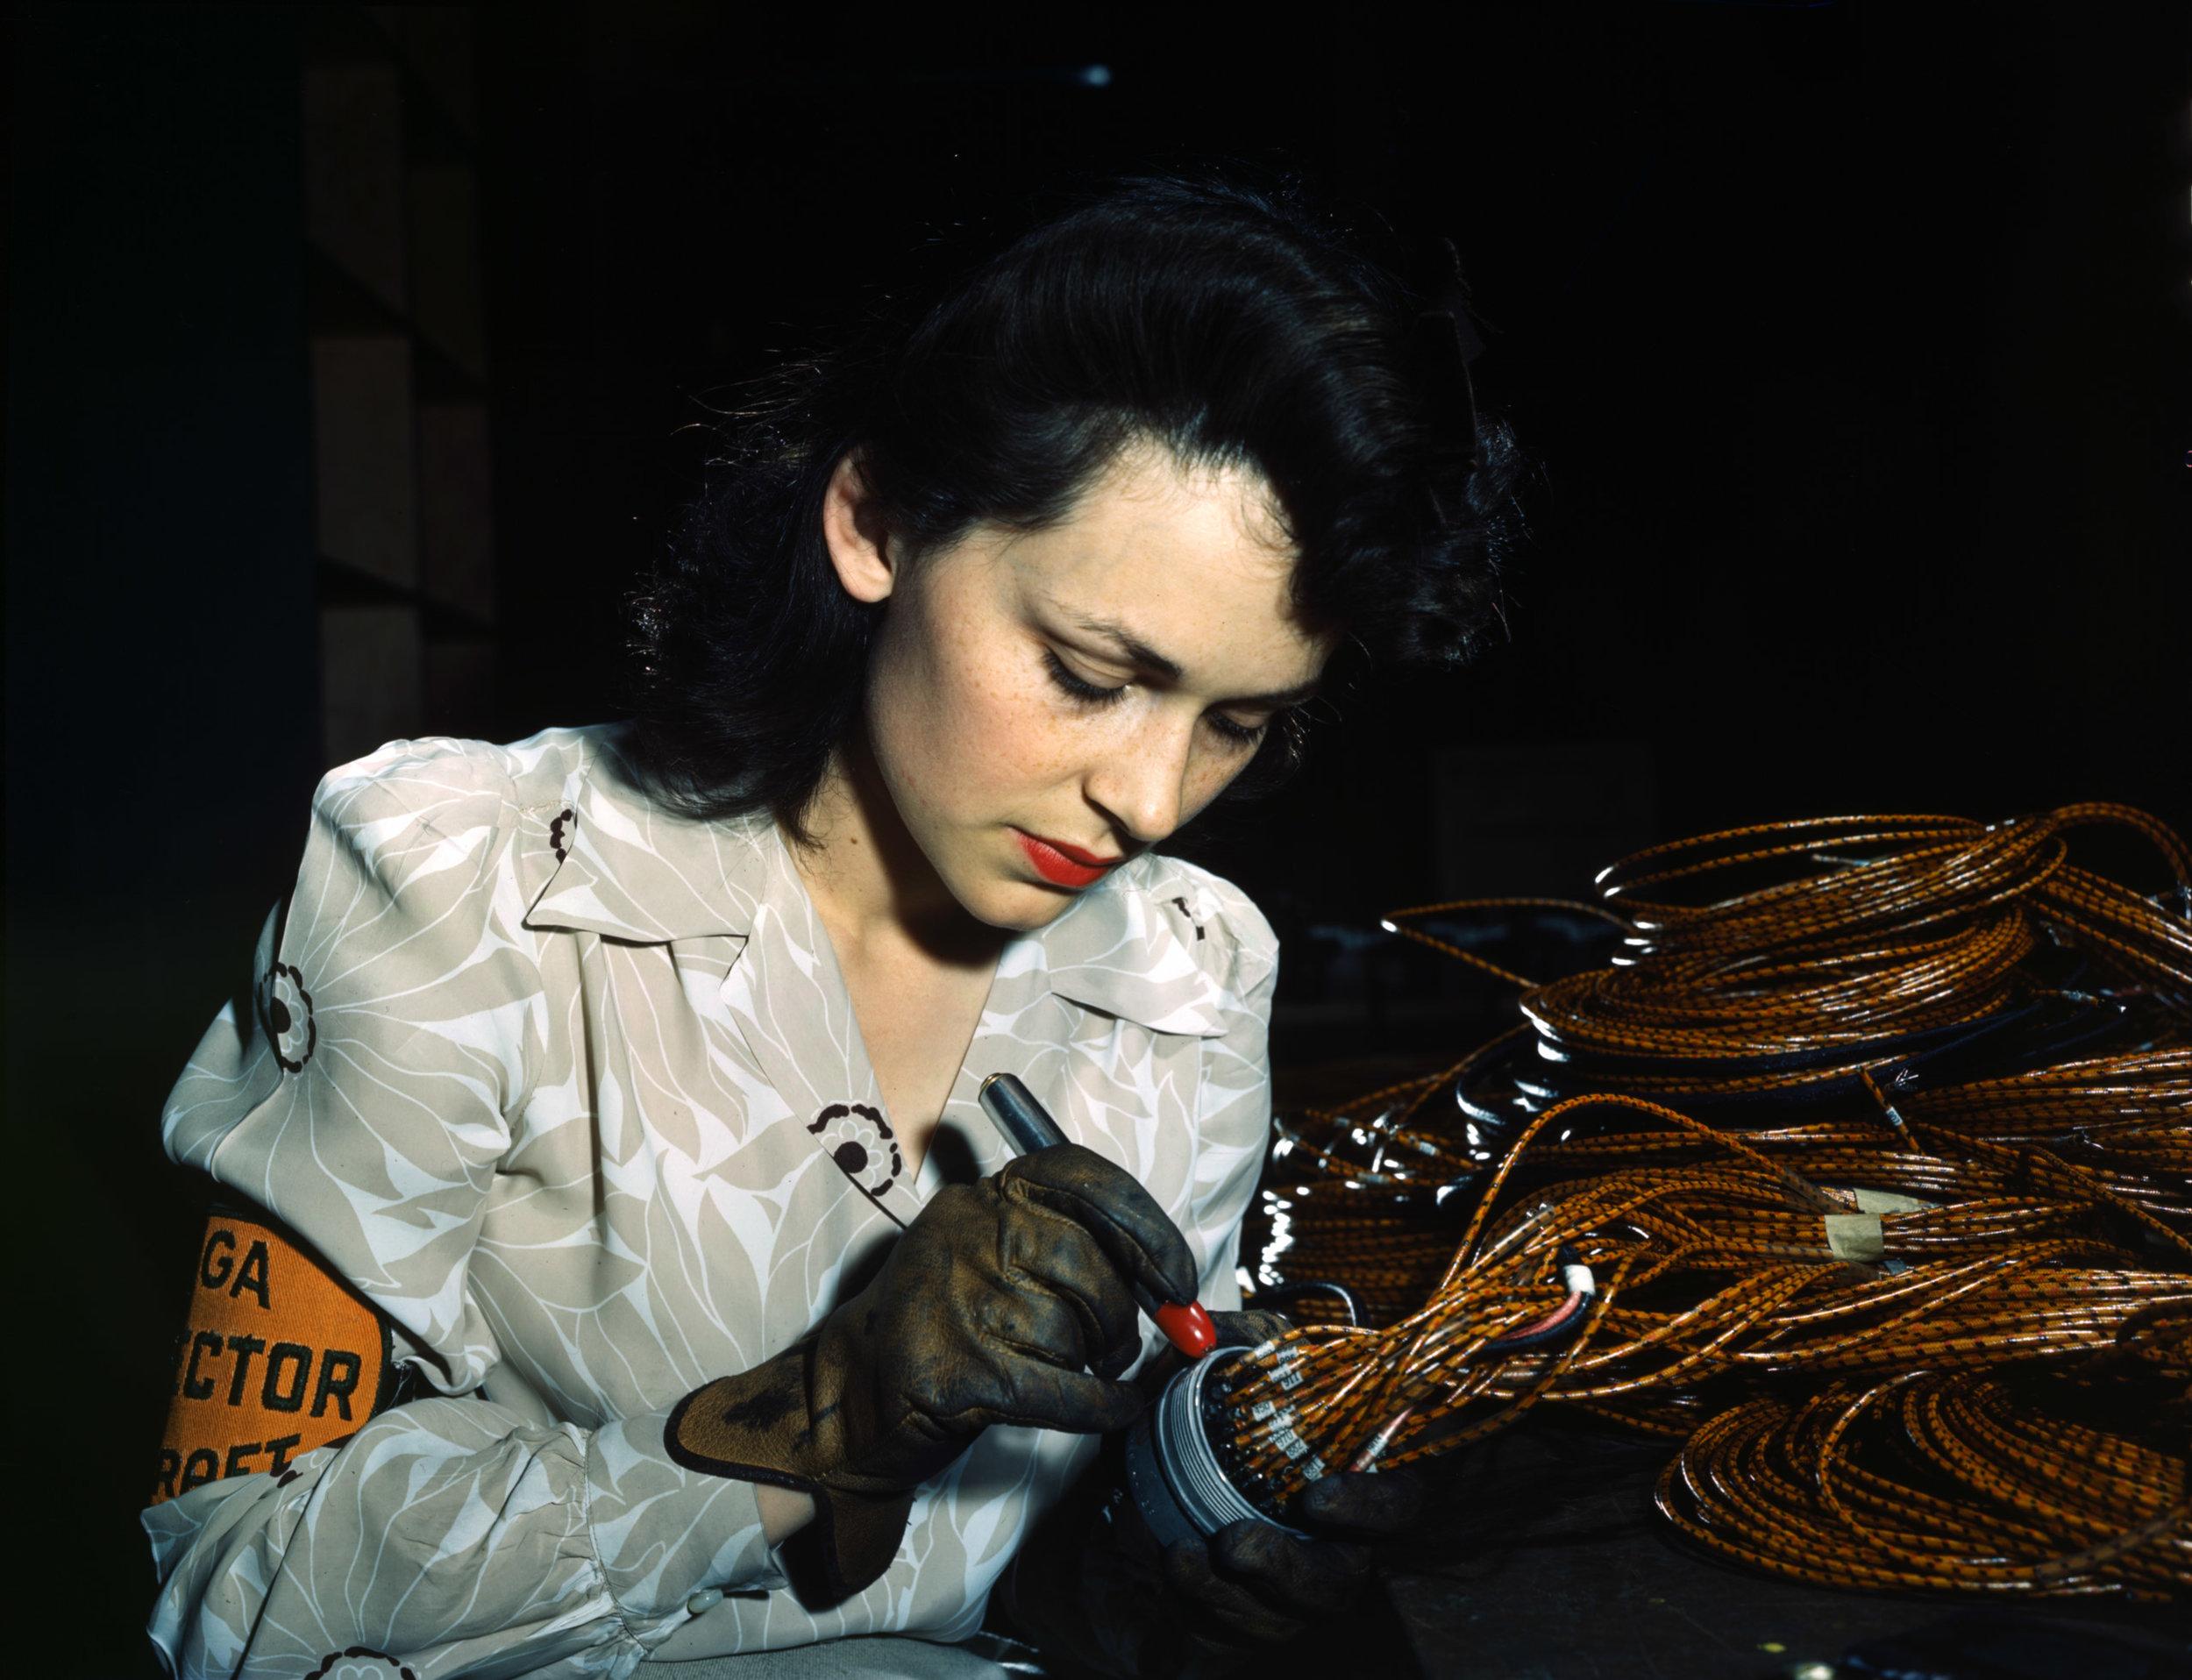 Checking electrical assemblies at Vega Aircraft Corporation, Burbank, California. Photographer: David Bransby